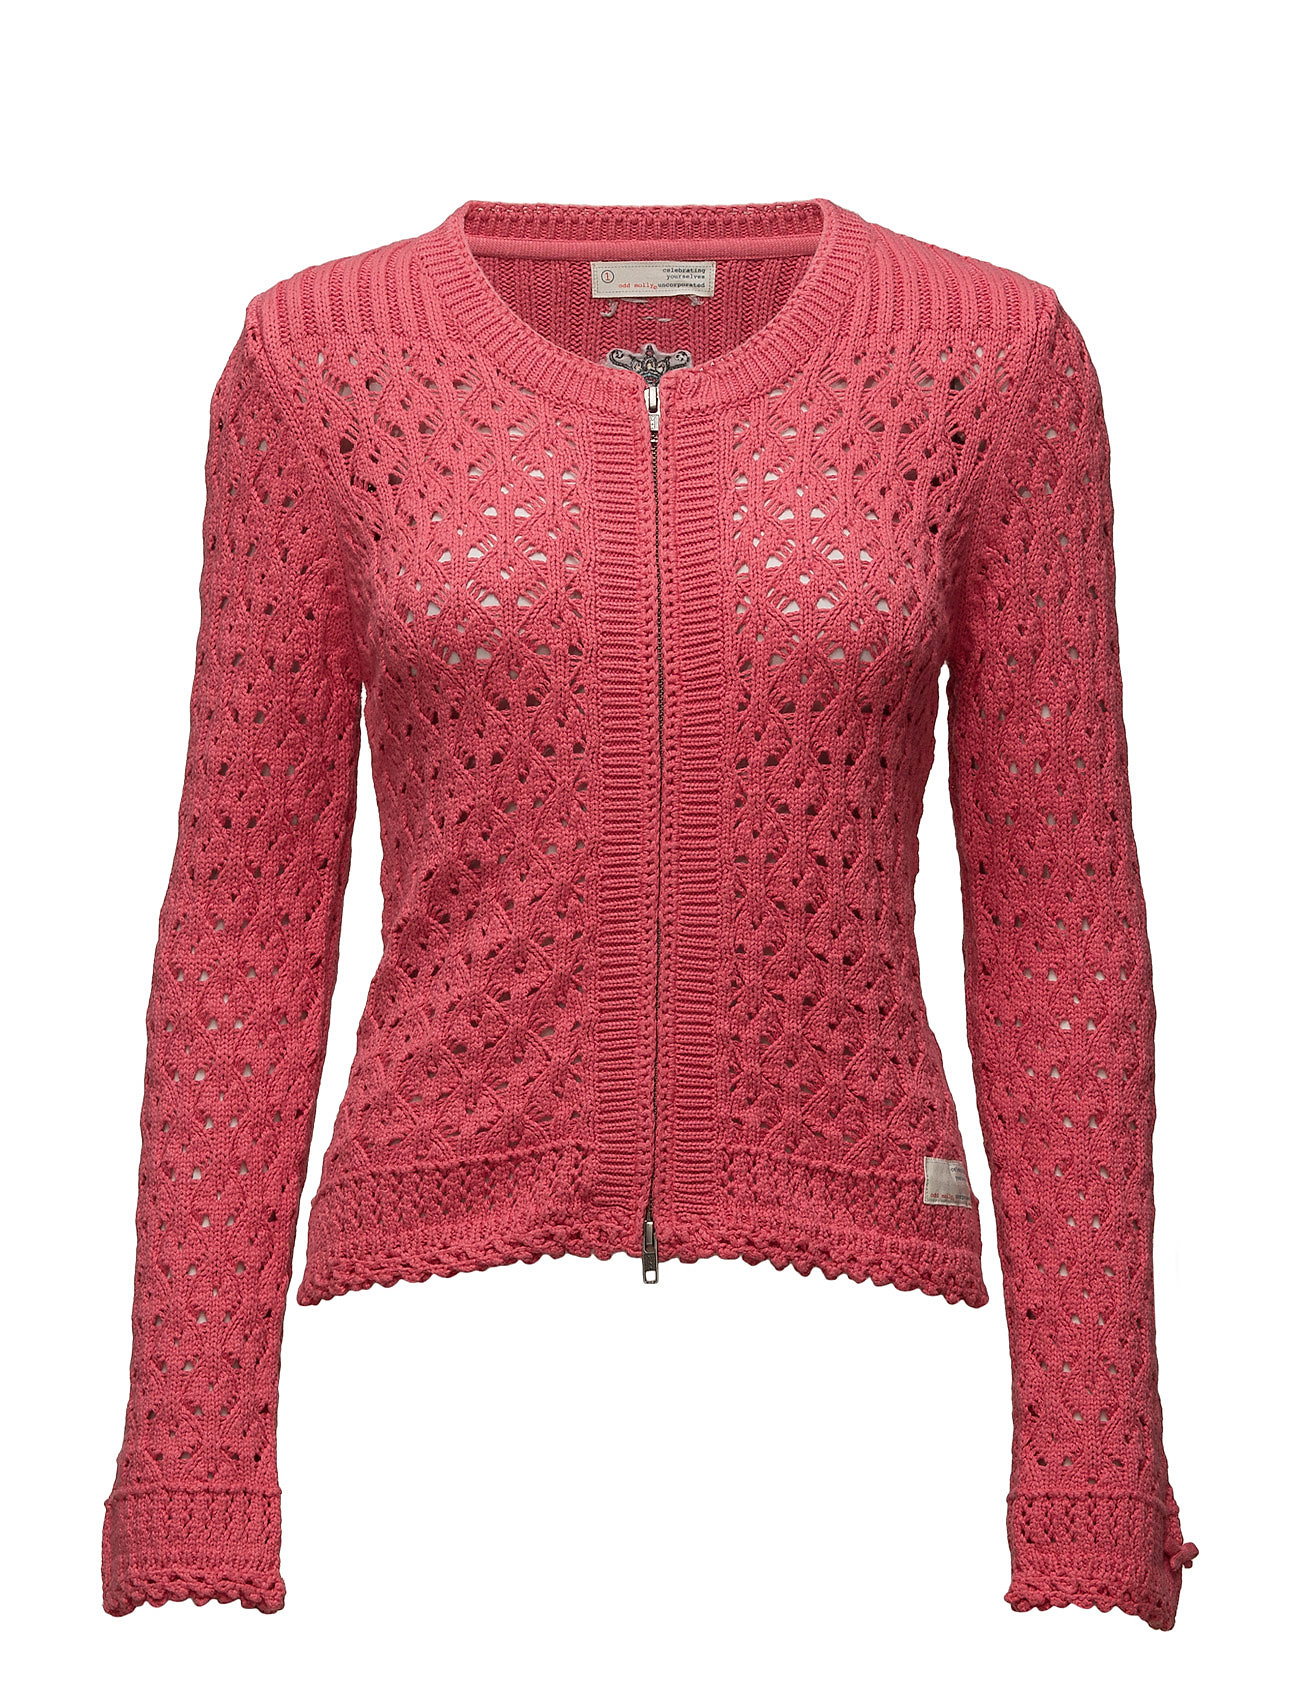 Harmony Knitted Jacket ODD MOLLY Striktøj til Kvinder i